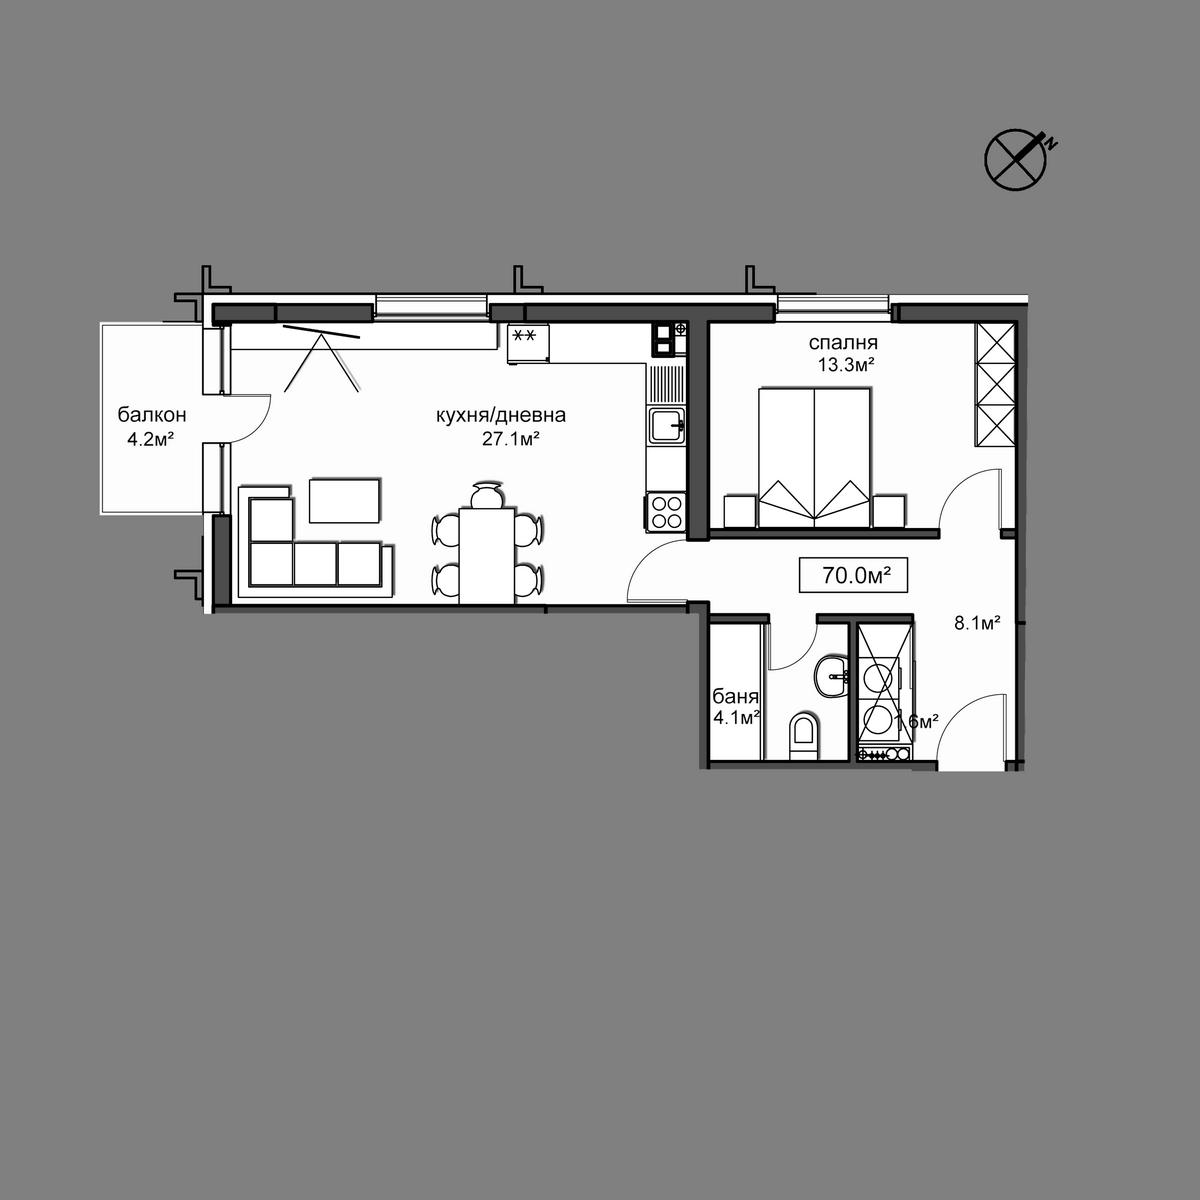 Продава апартамент ново строителство - Апартамент  20